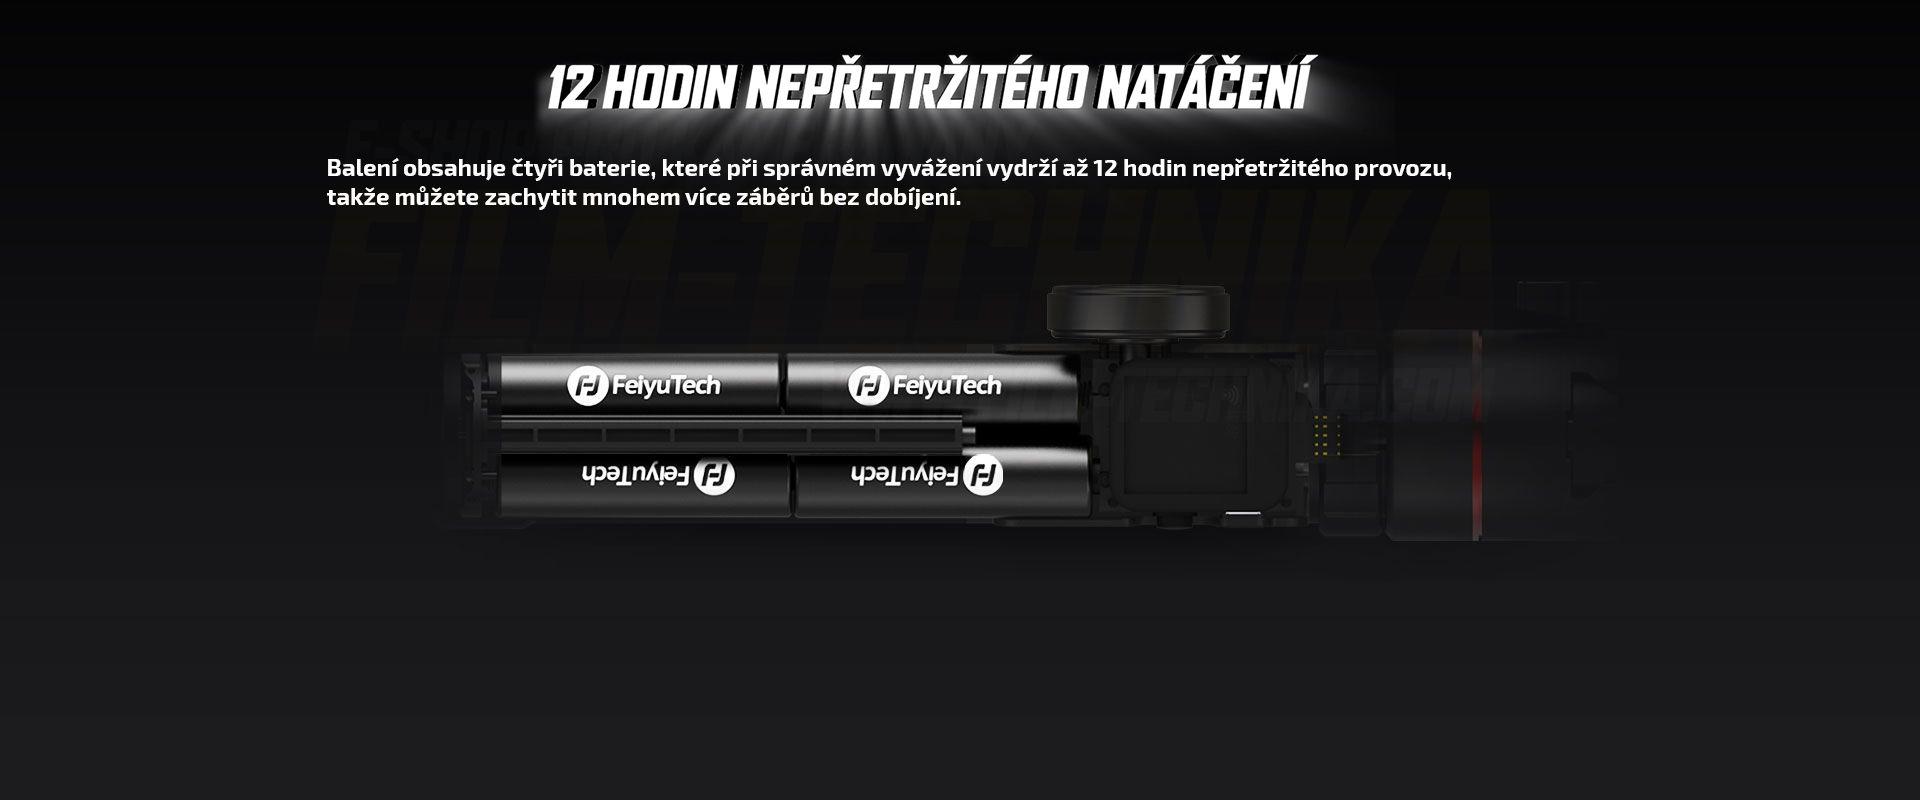 film-technika-feiyu-ak2000-12intext